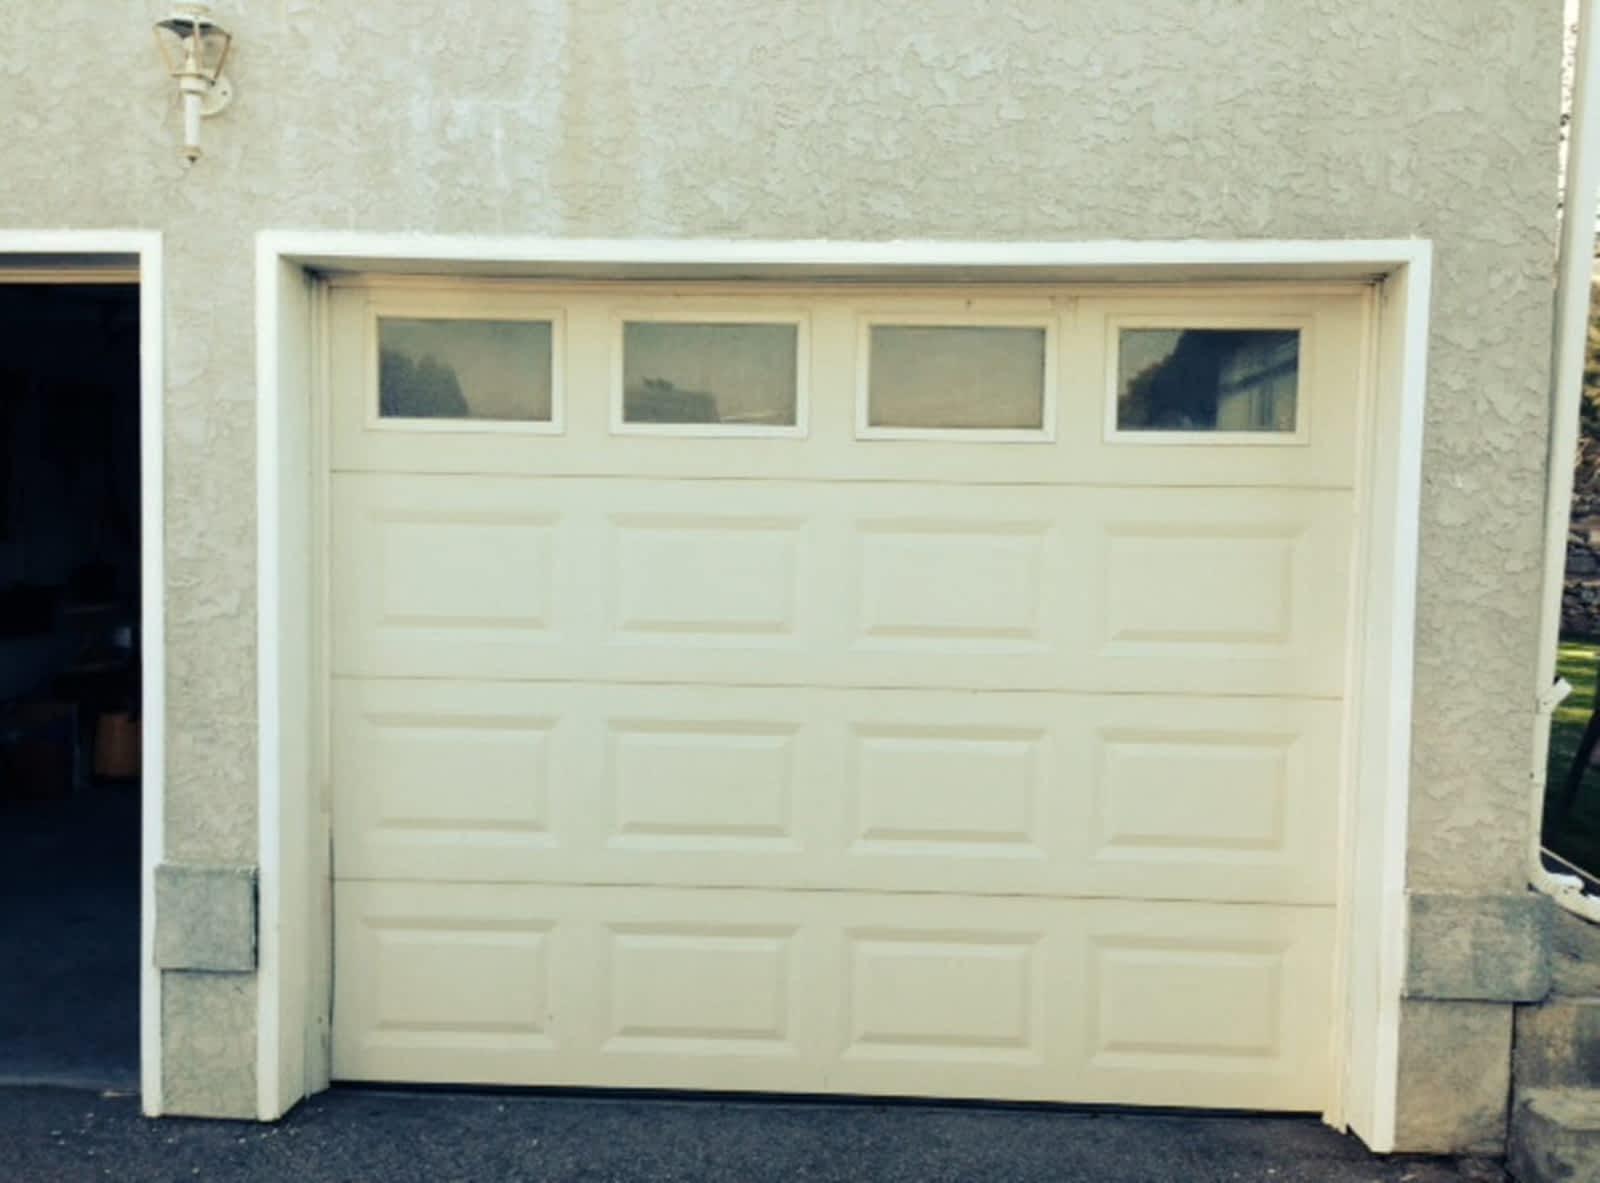 & Bob\u0027s Door Service - Opening Hours - 203 West Bench Dr Penticton BC Pezcame.Com